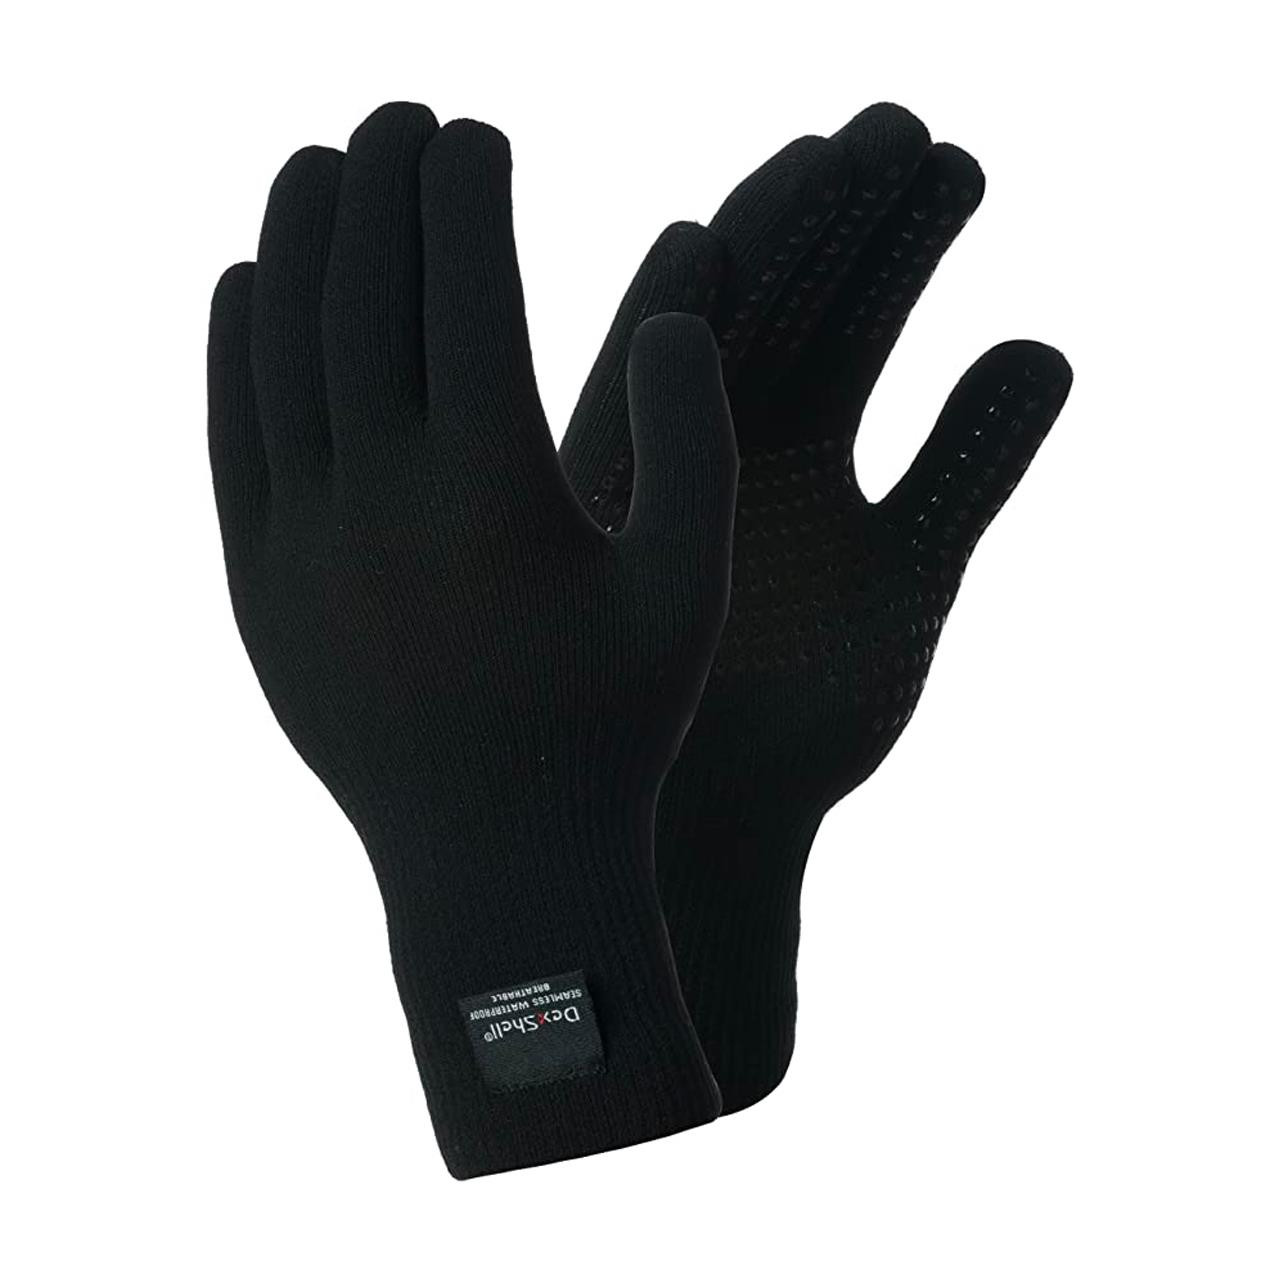 Dexshell Touchfit Waterproof Breathable Gloves (Black, Last Generation)